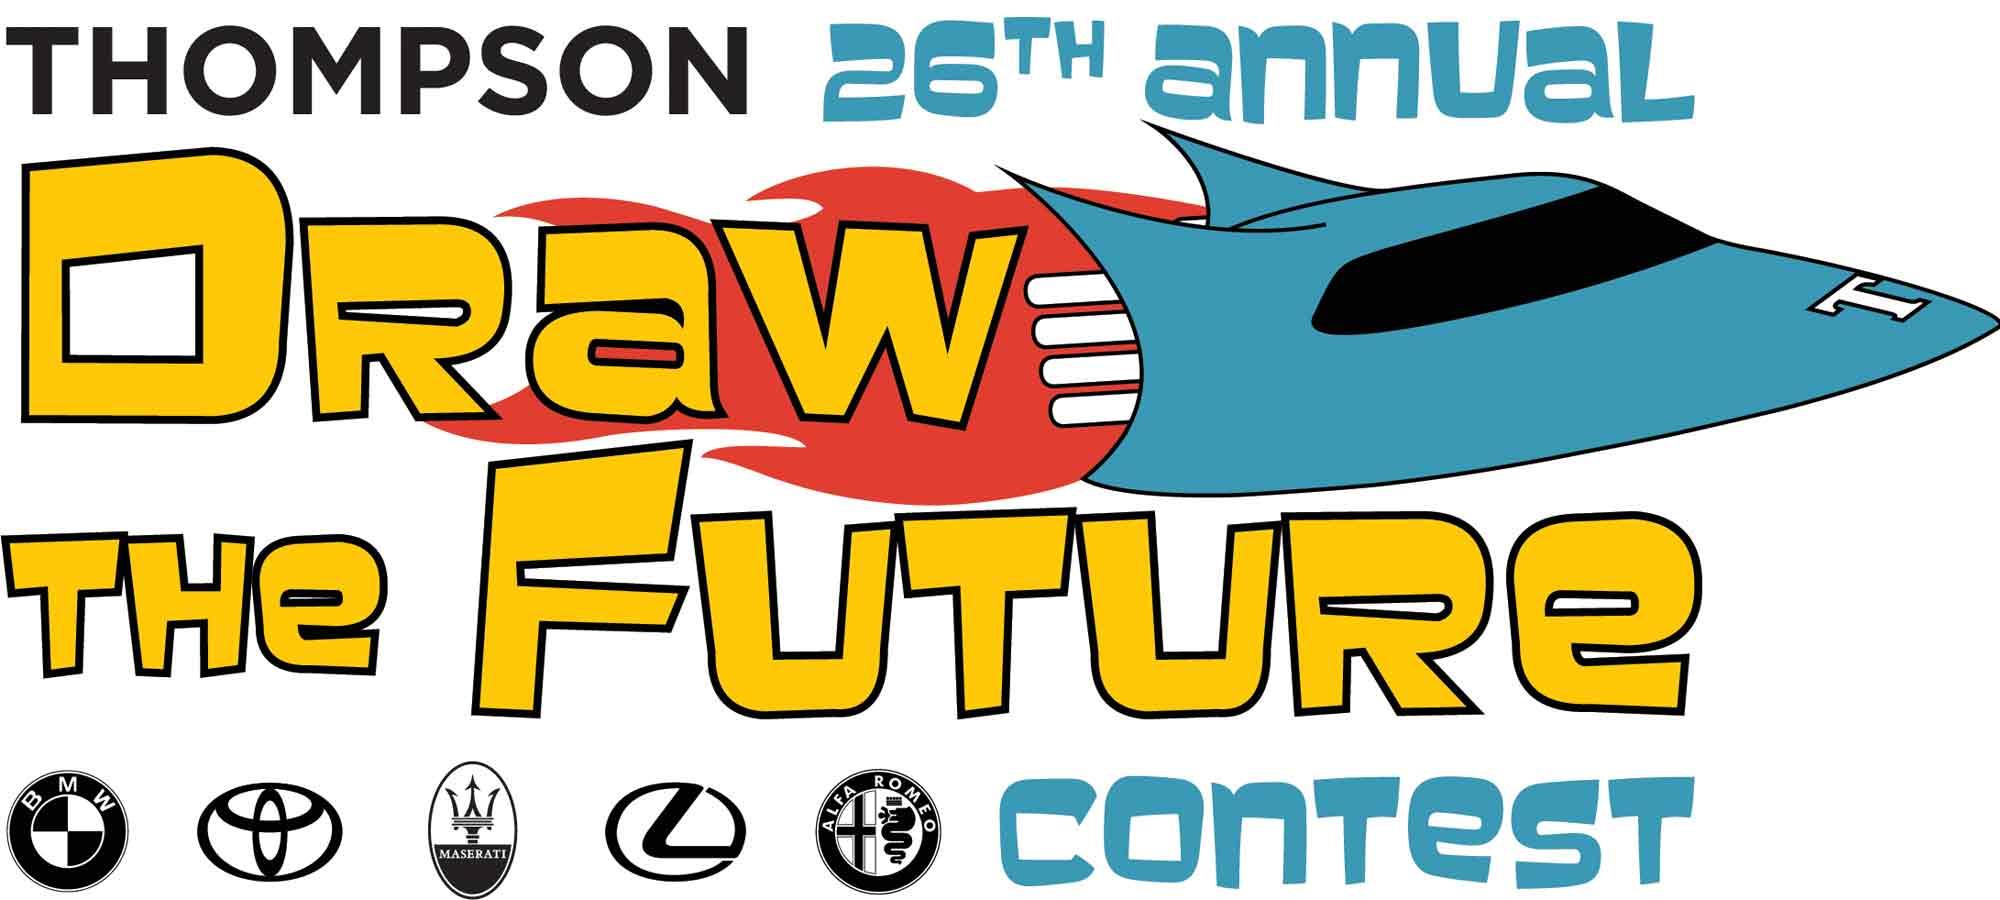 Thompson Draw the Future Contest 2017